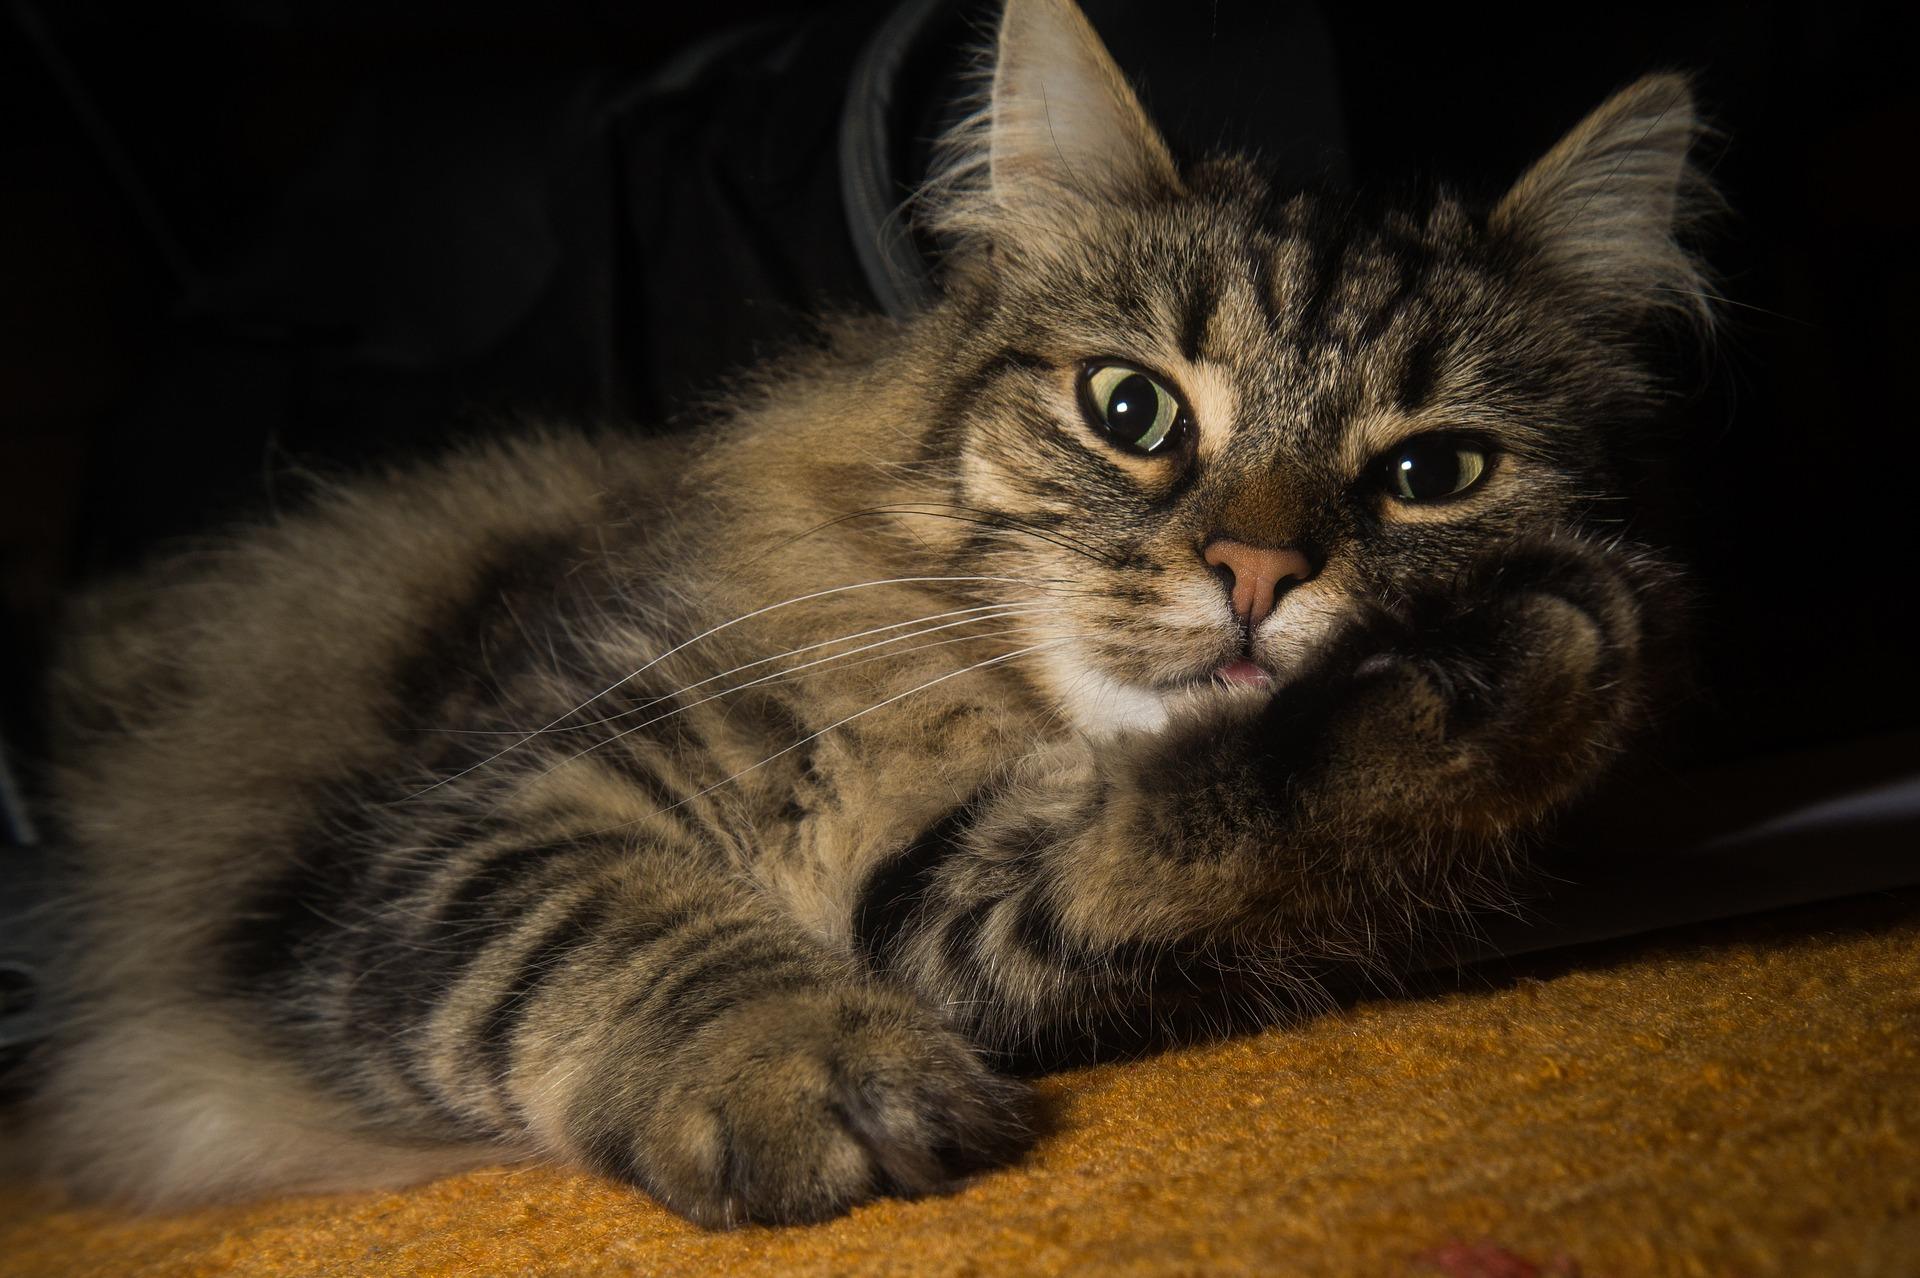 noorse boskat kittens